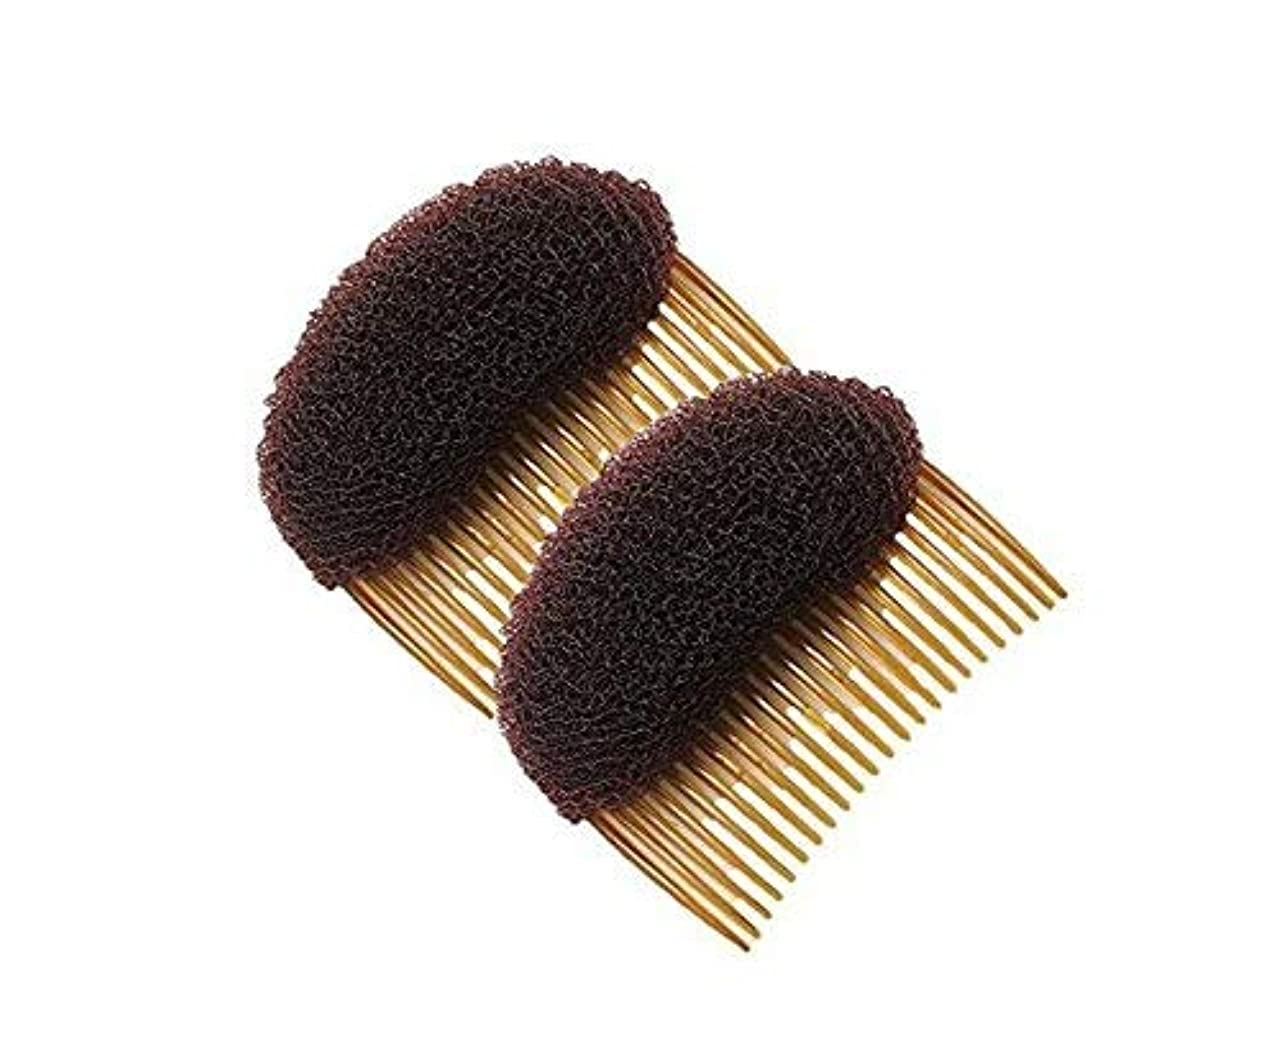 2PCS 23 Teeth Hair Fringe Volume Bump Up Inserts Tools-Hair Pin Hair Styling Clip Hair Charming Insert Do Beehive...